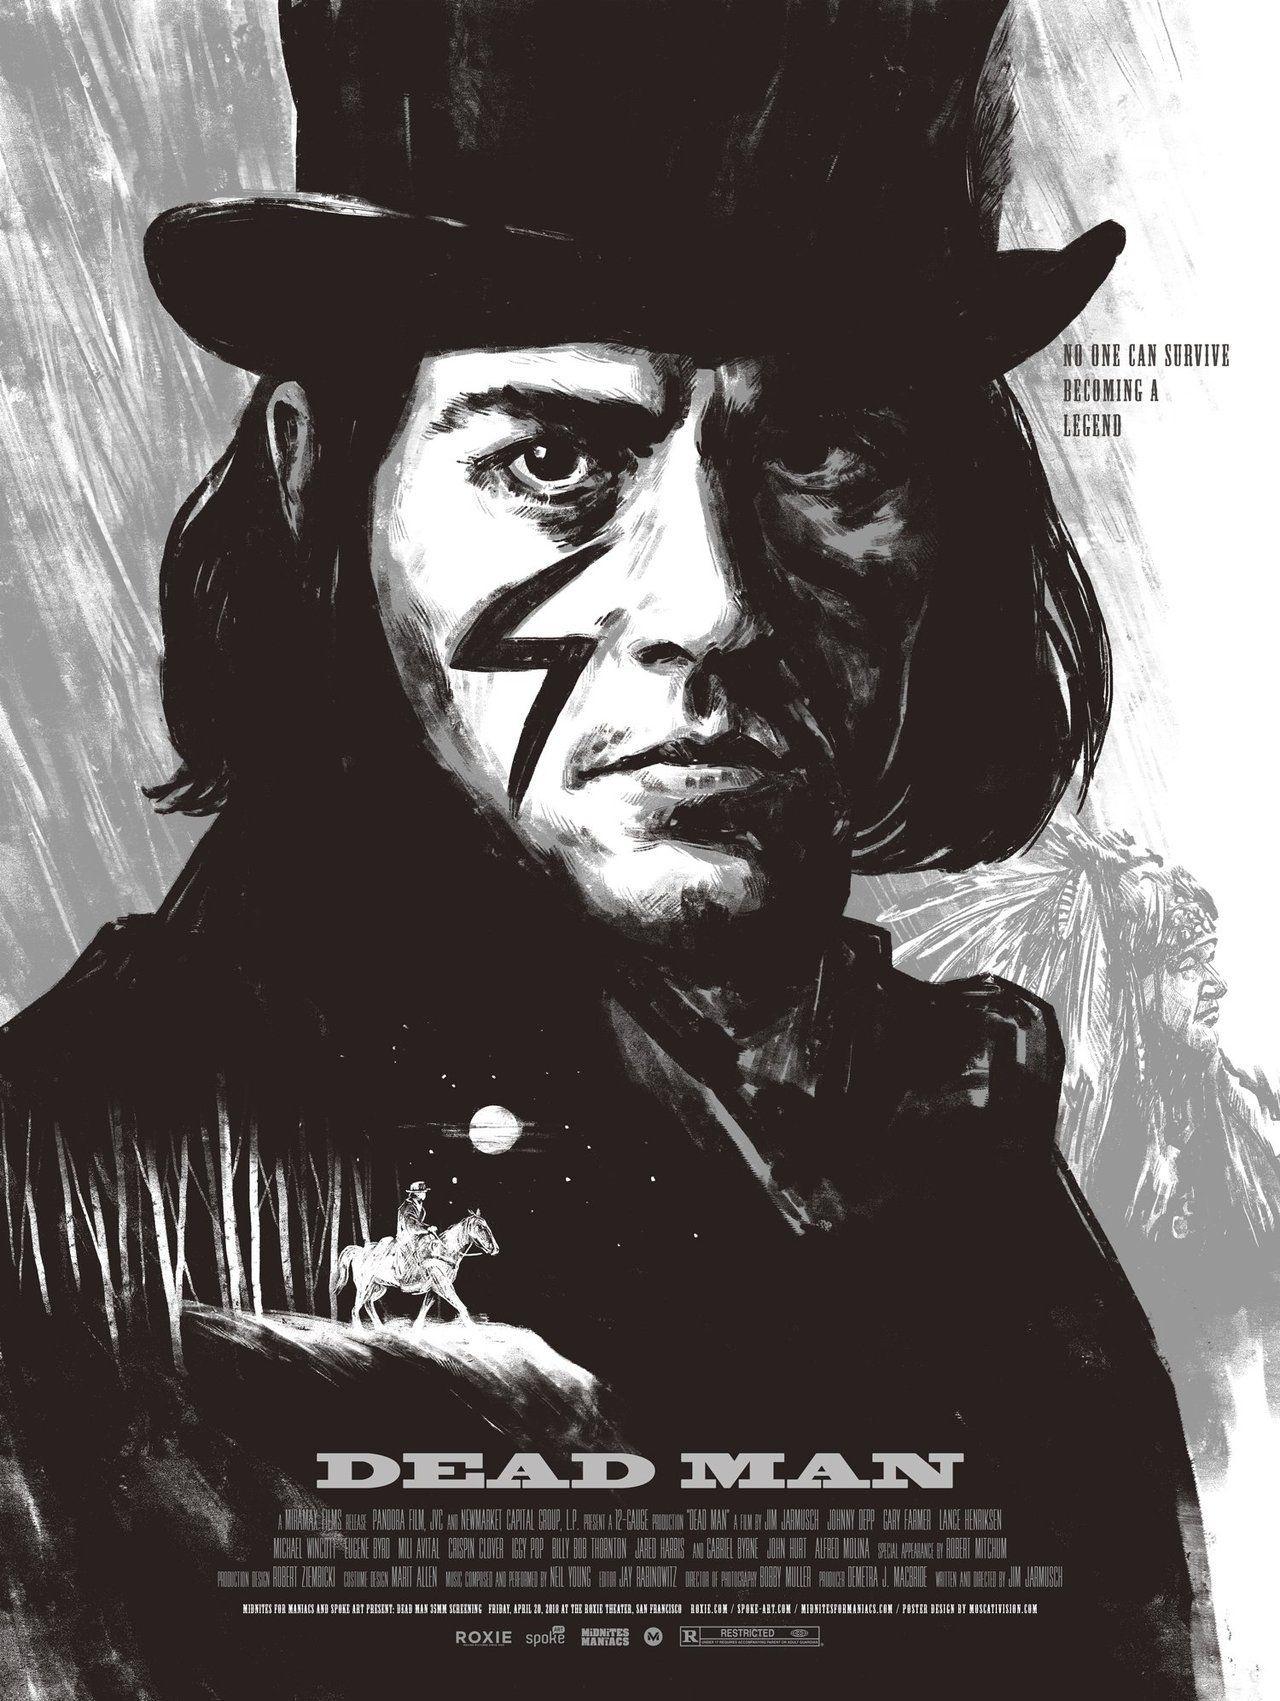 Dead Man 1995 1280 X 1701 Films Complets Cinema Cine